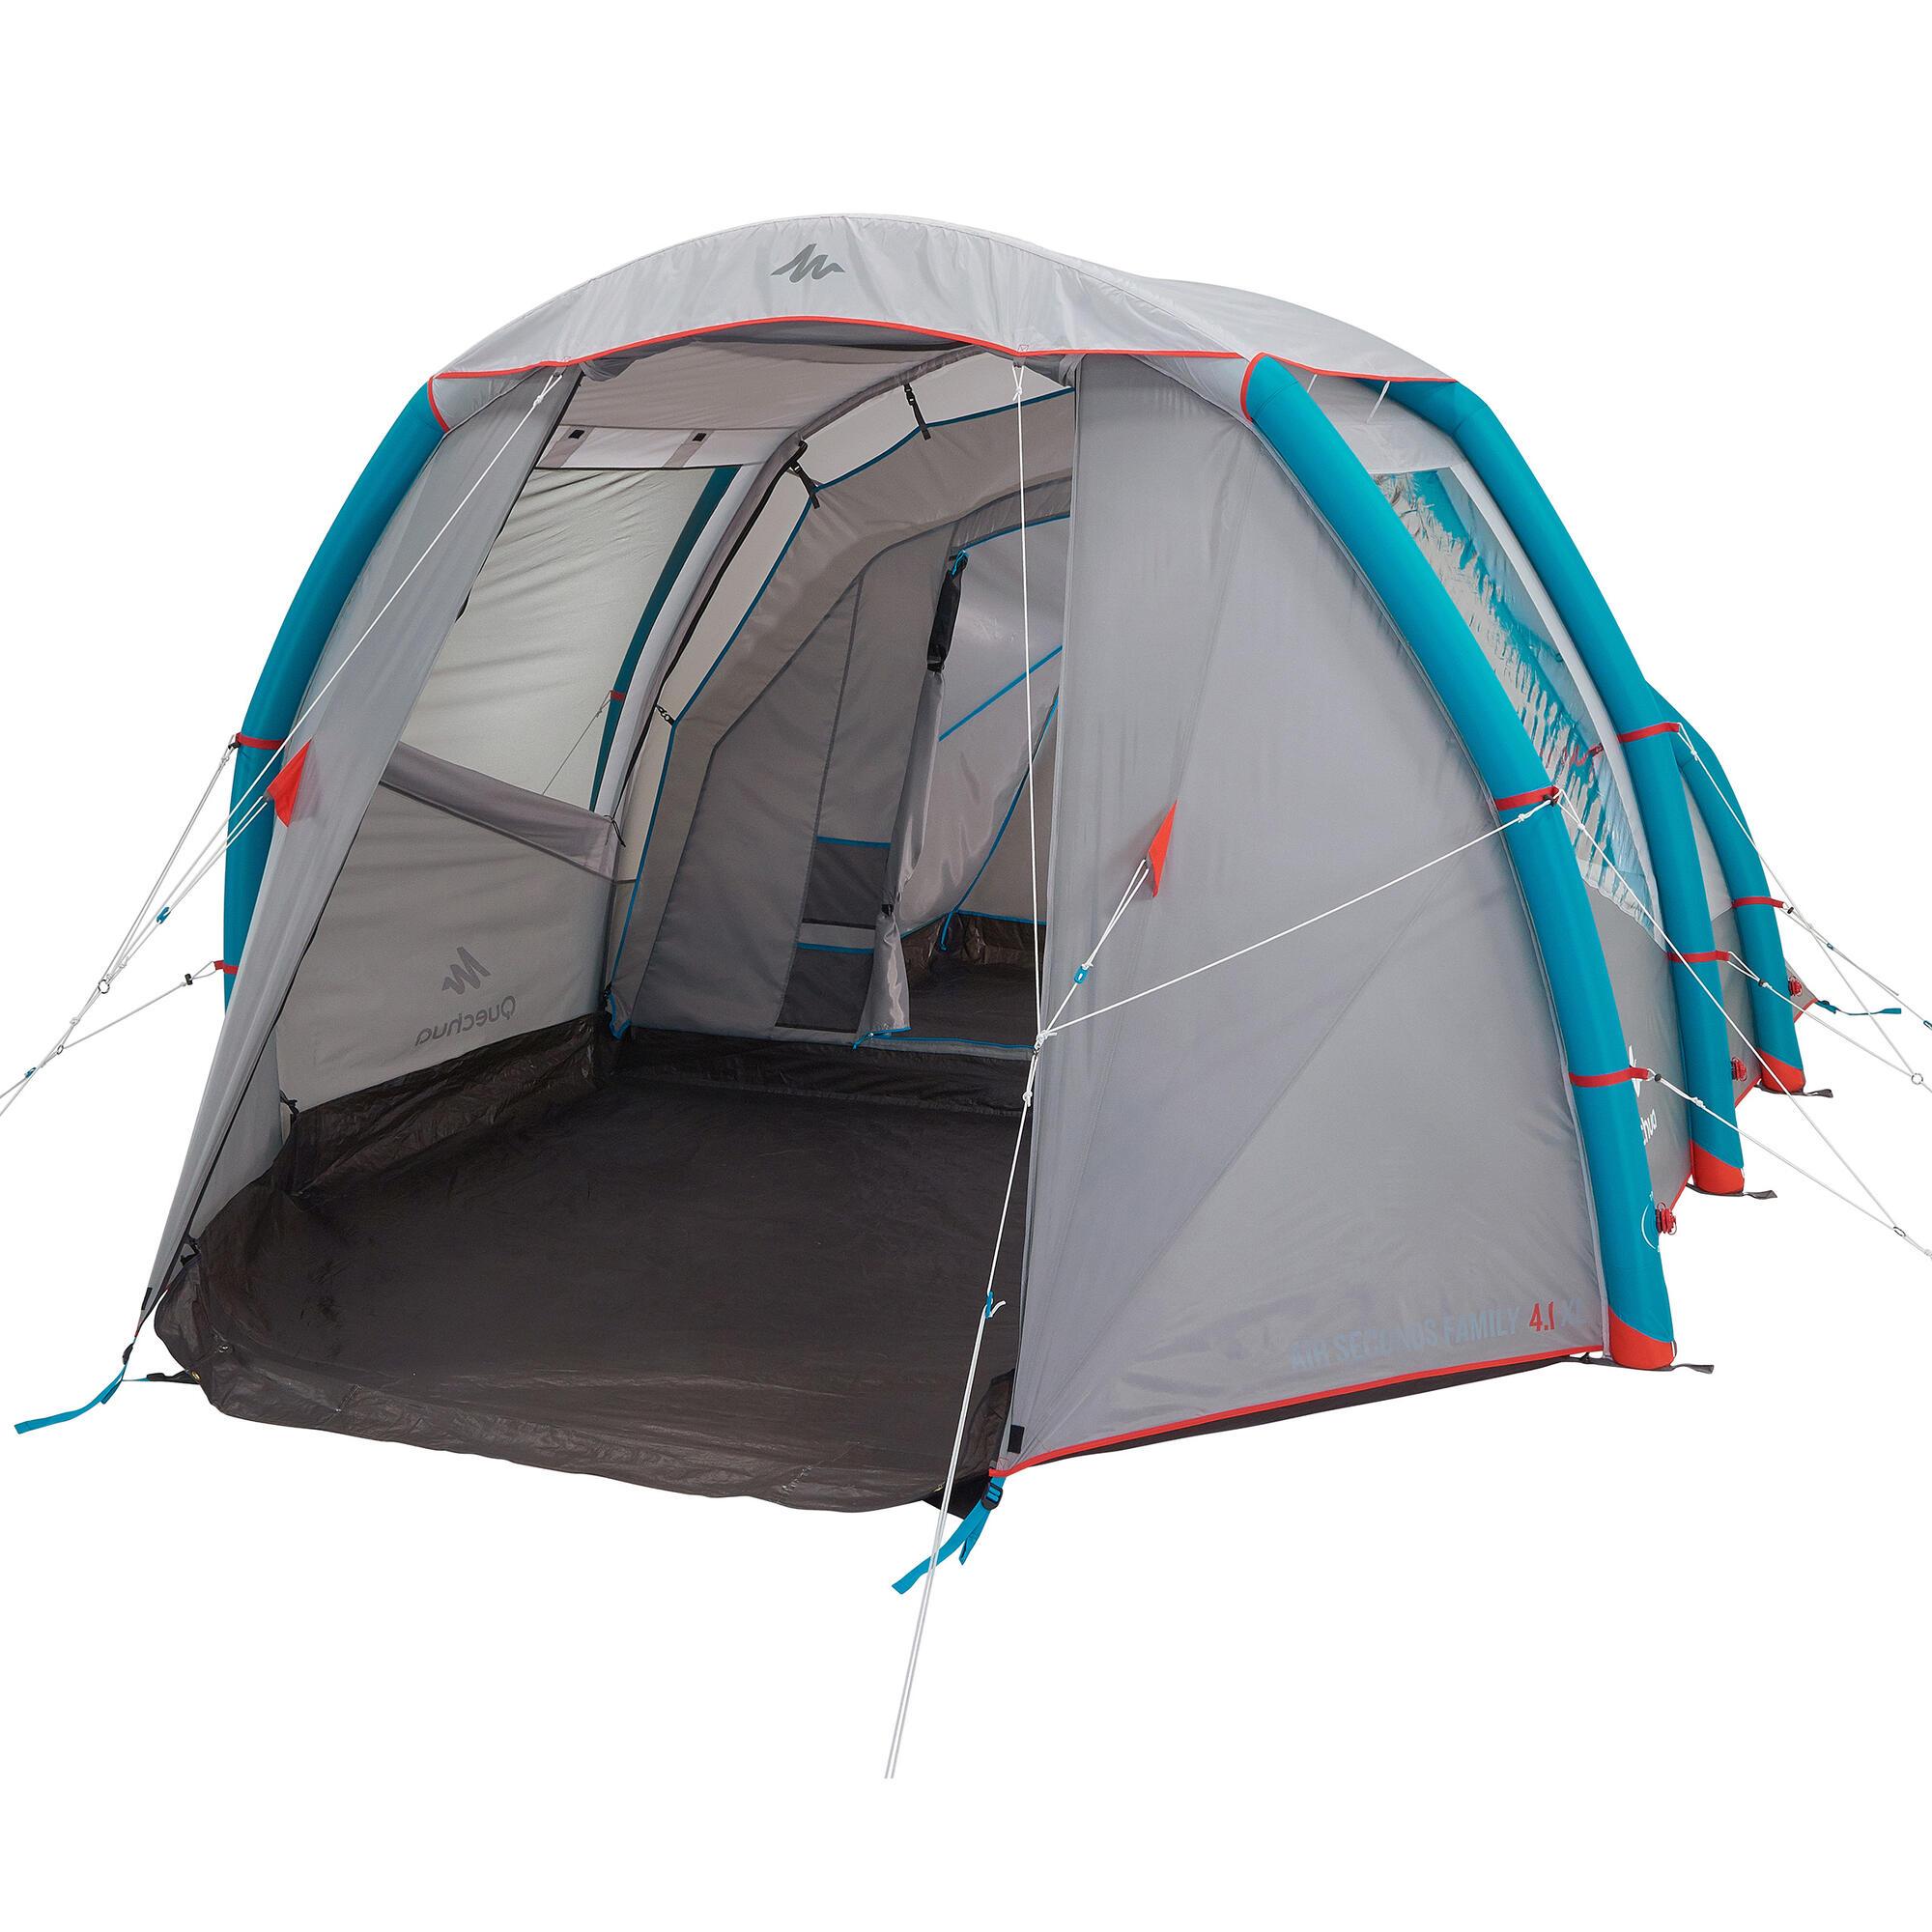 air seconds 4 1 xl family camping tent 4 person quechua. Black Bedroom Furniture Sets. Home Design Ideas